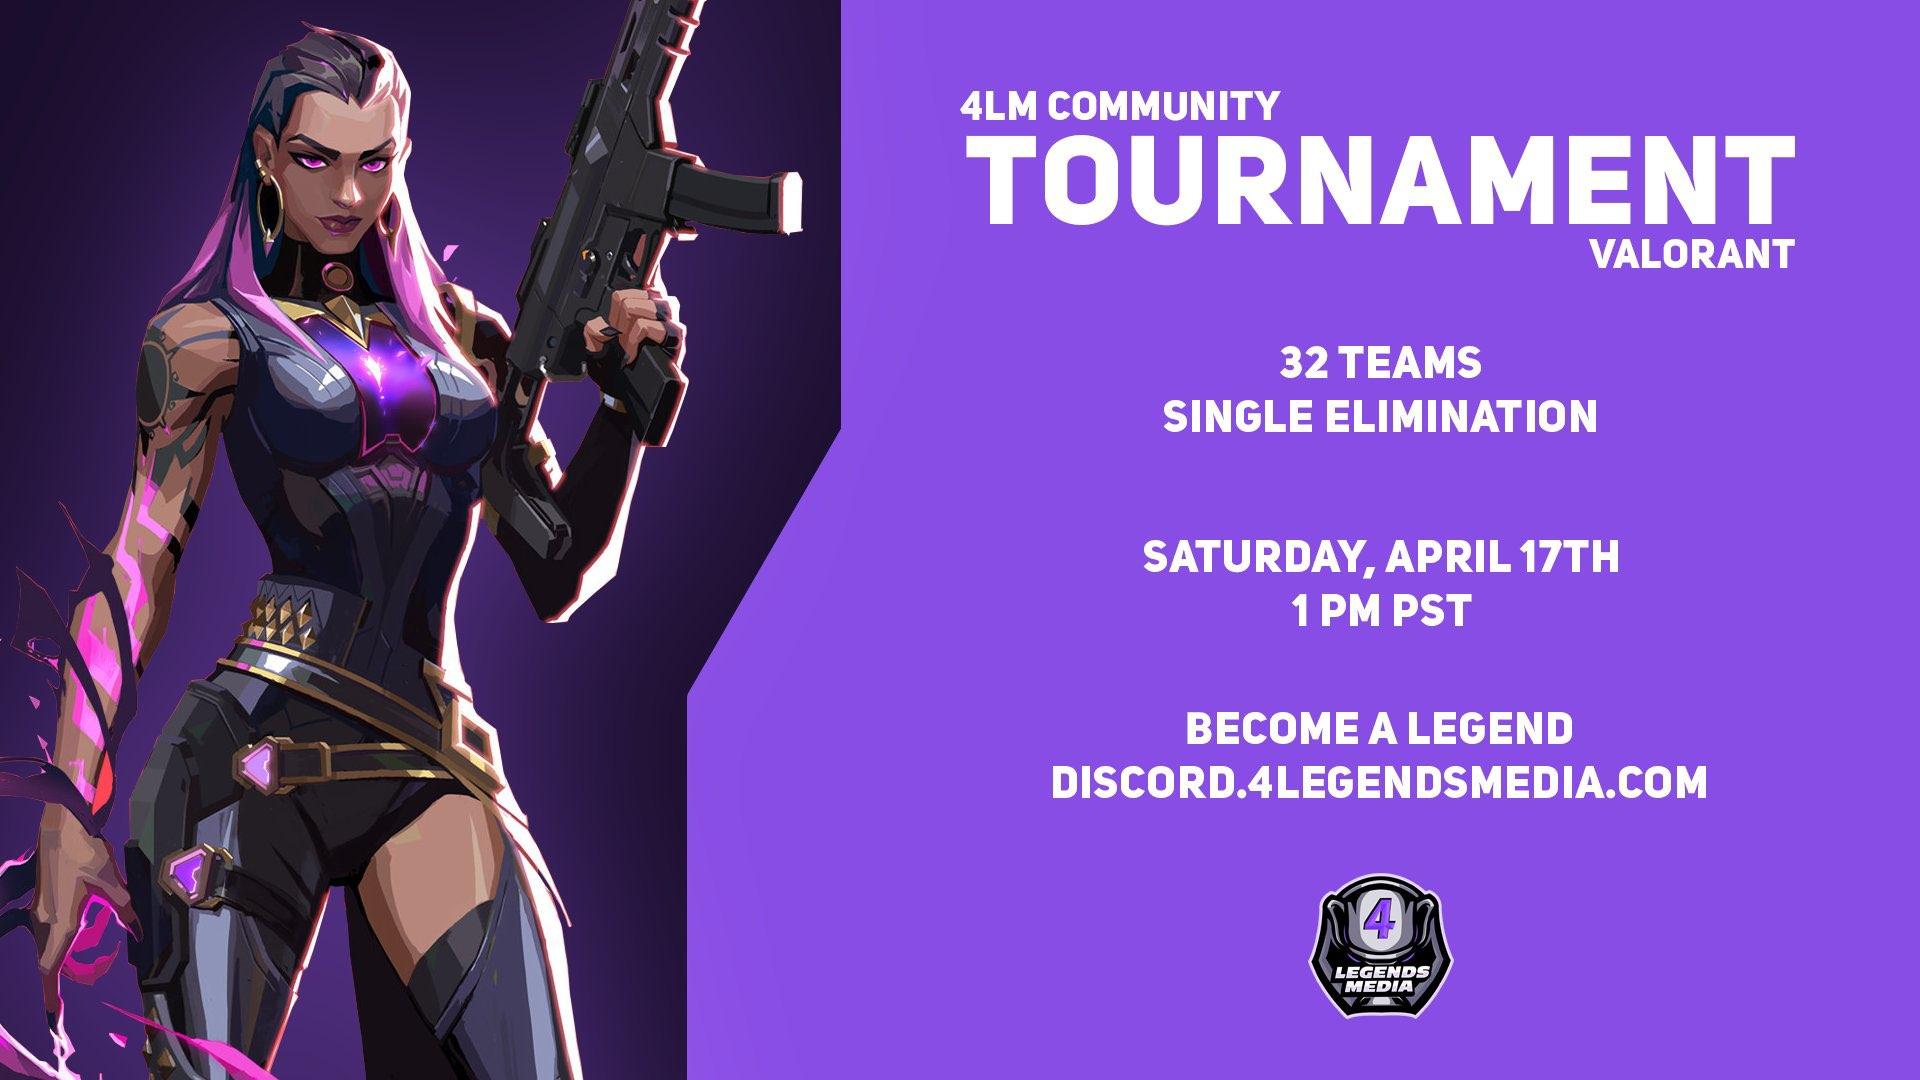 The next 4LM Valorant Tournament